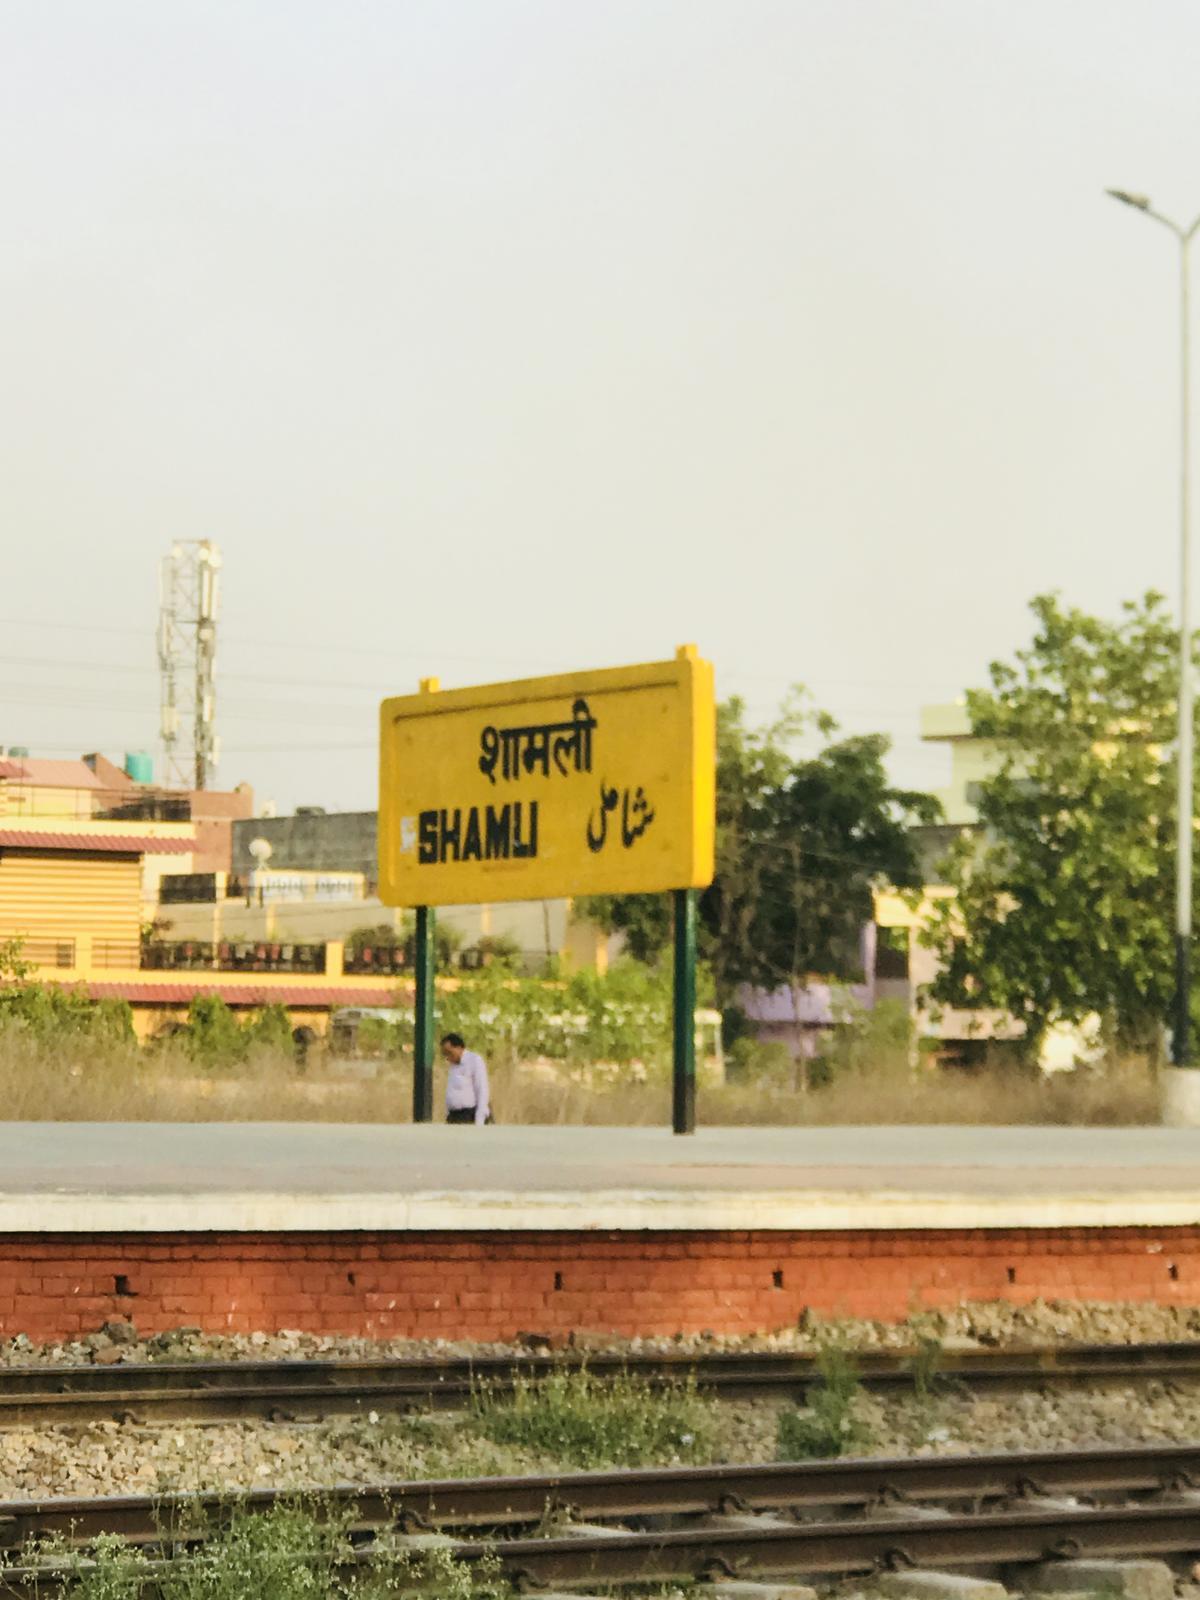 Shamli to Haridwar: 2 Trains, Shortest Distance: